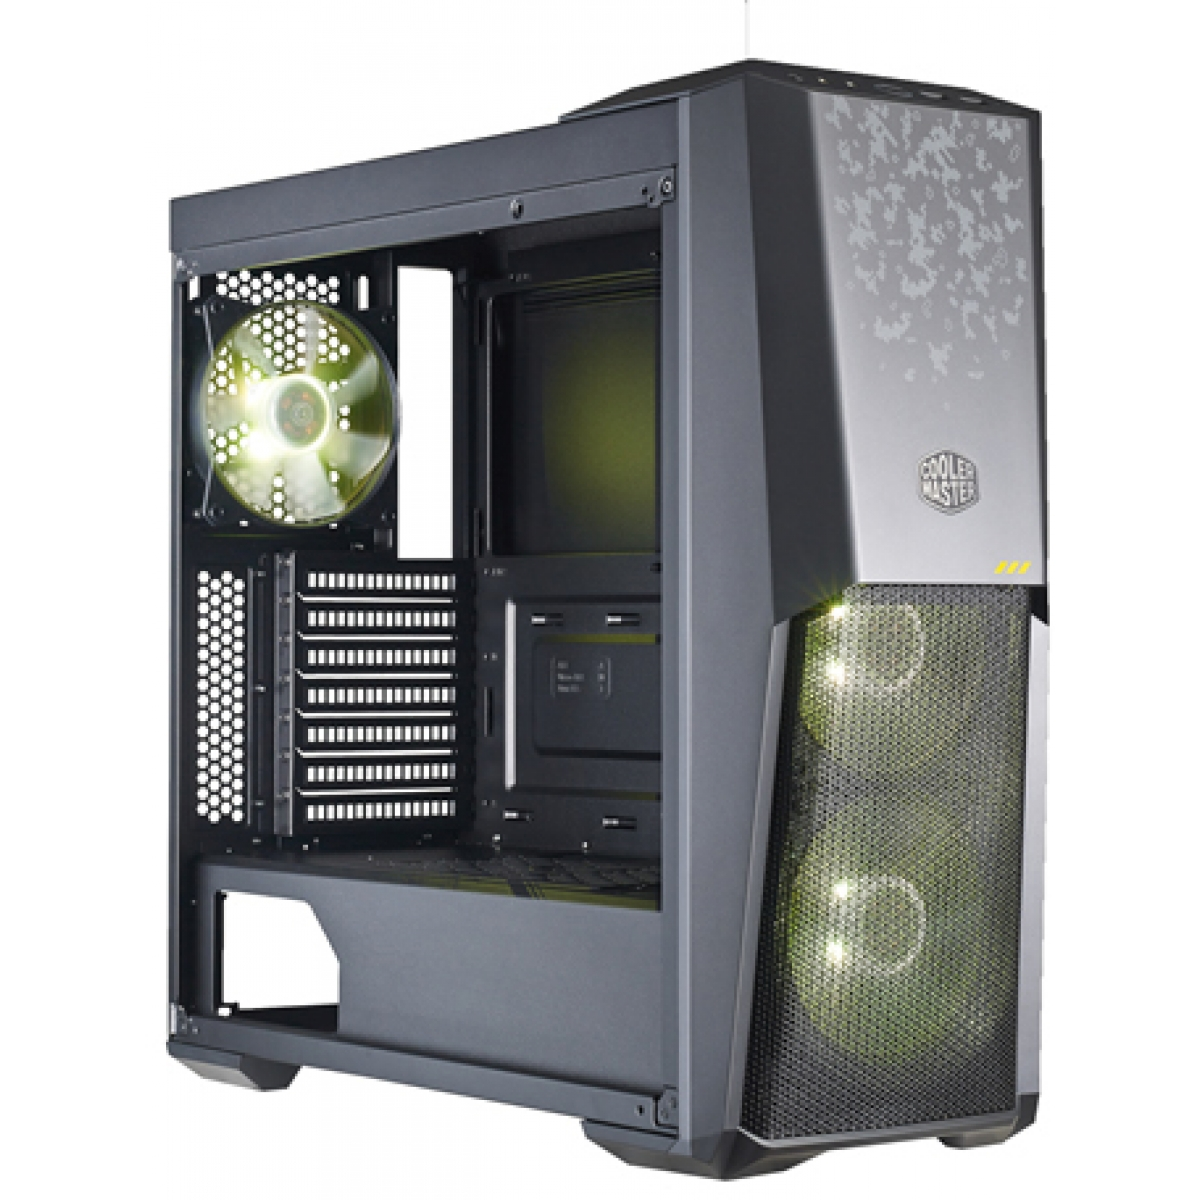 Gabinete Gamer Cooler Master Masterbox MB500 Tuf Gaming, Mid Tower, Com 3 Fans RGB, Vidro Temperado, Black, Sem Fonte, MCB-B500D-KGNN-TUF